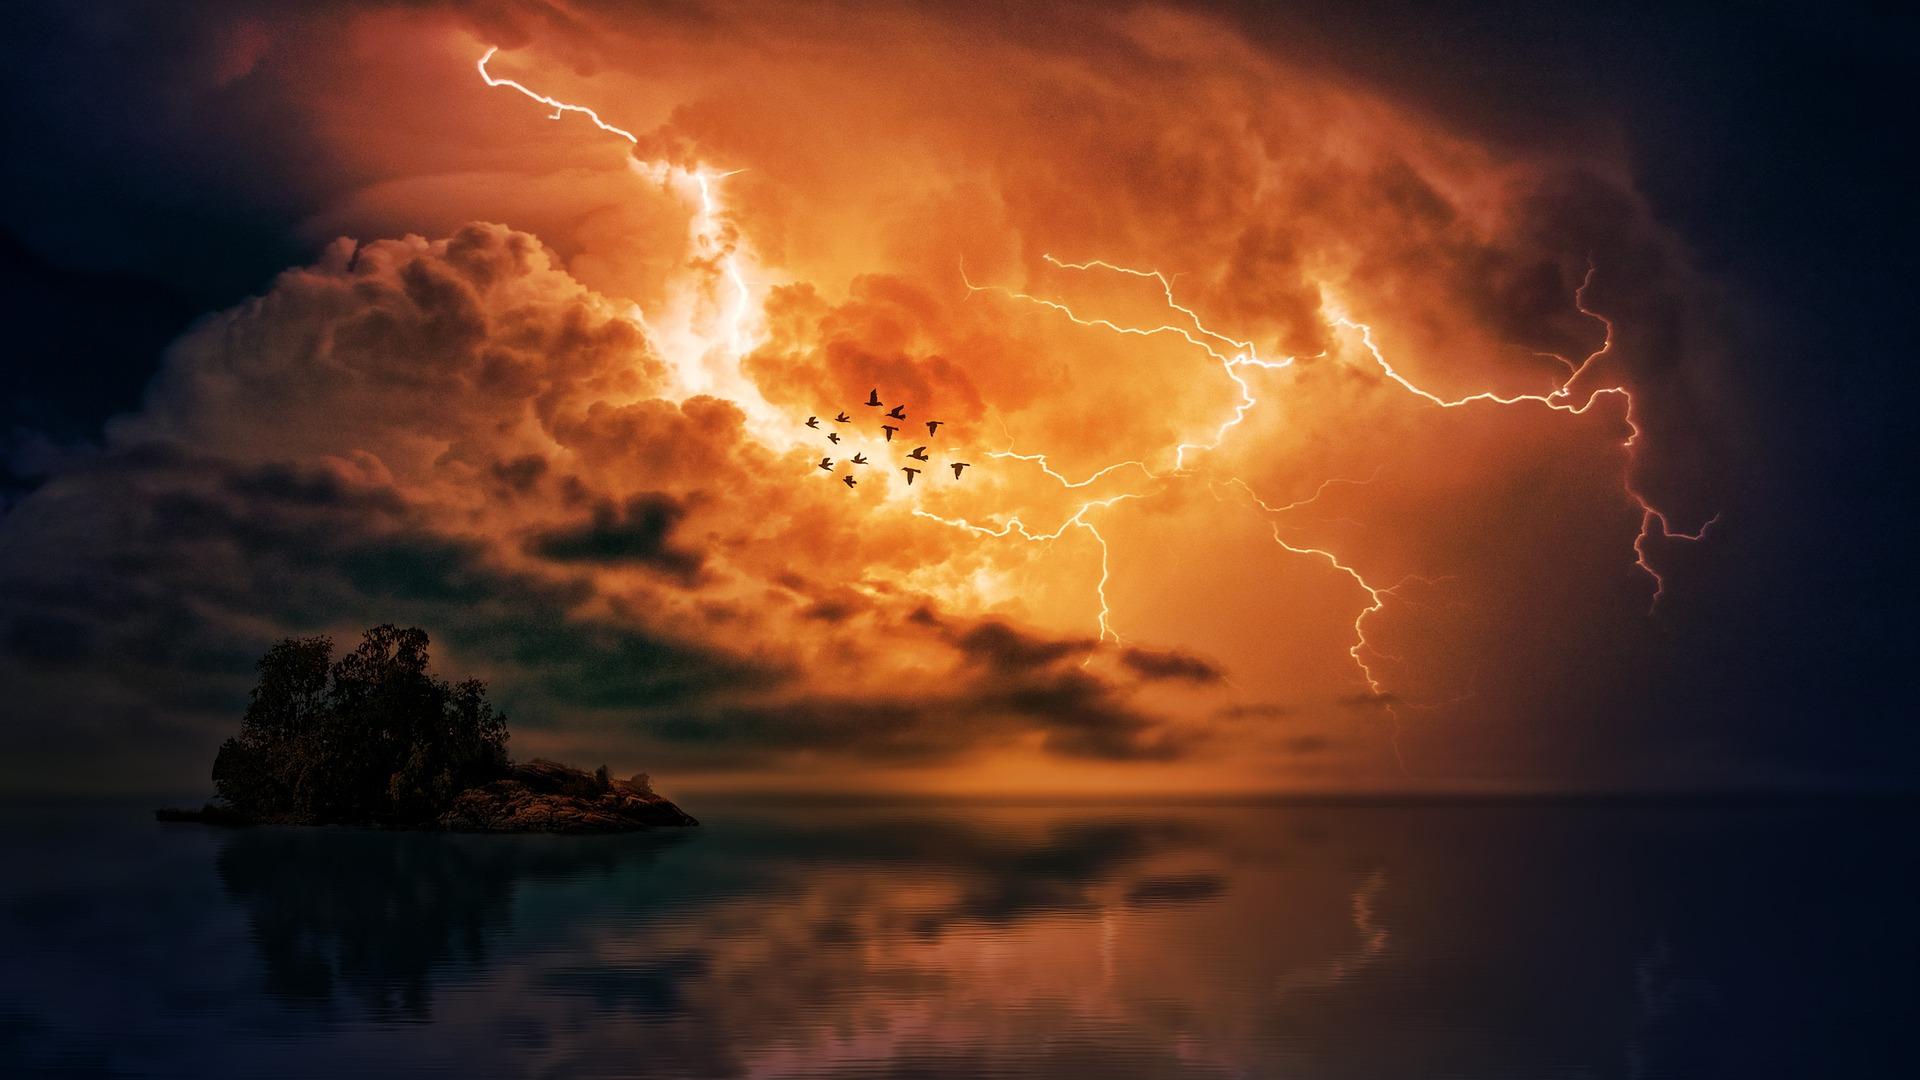 Storm en onrust